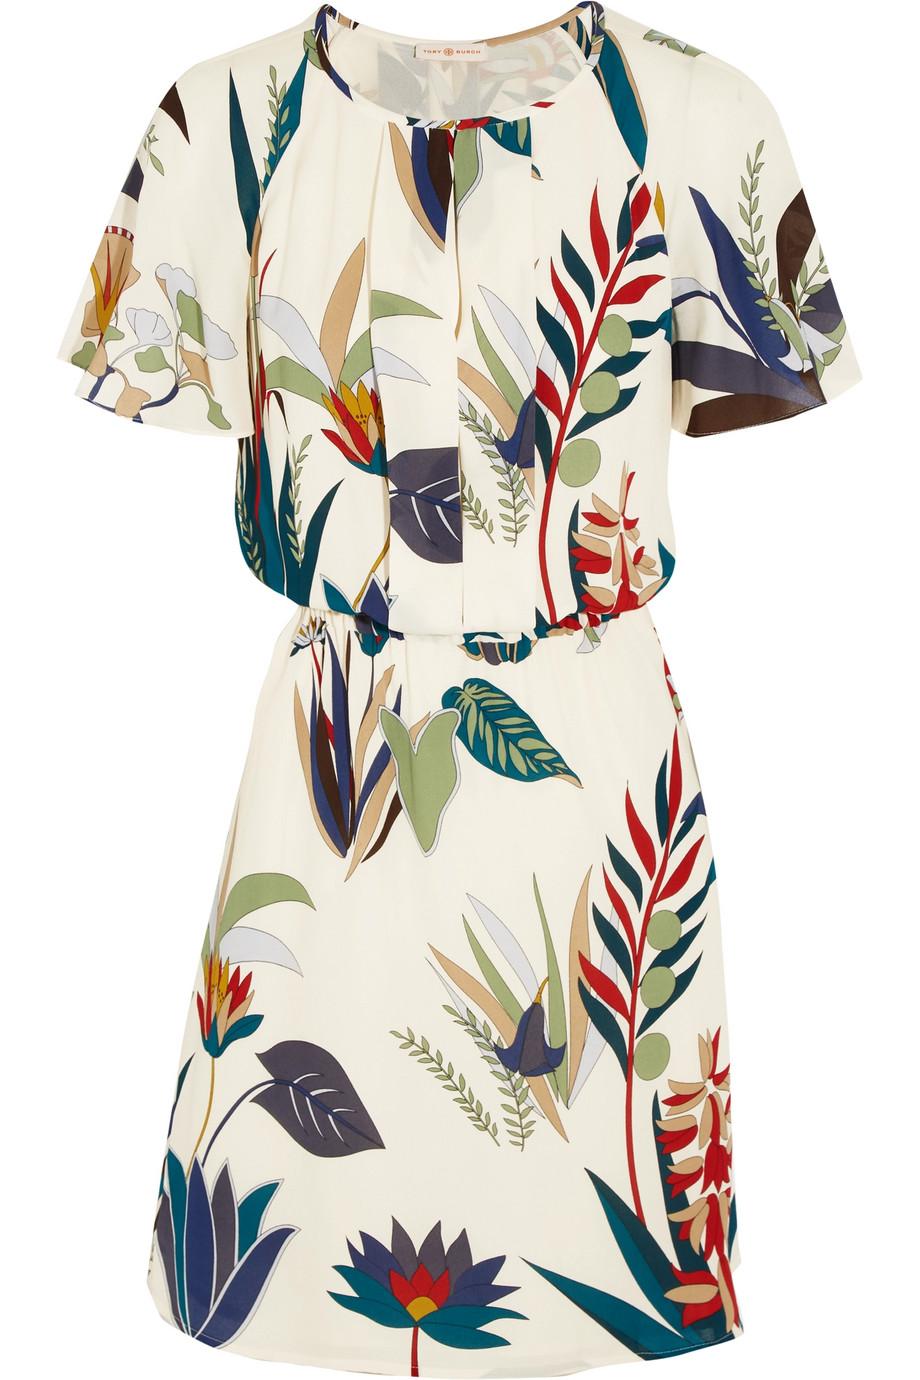 Tory Burch Anatolia Printed Silk-Georgette Dress, White, Women's - Printed, Size: 10